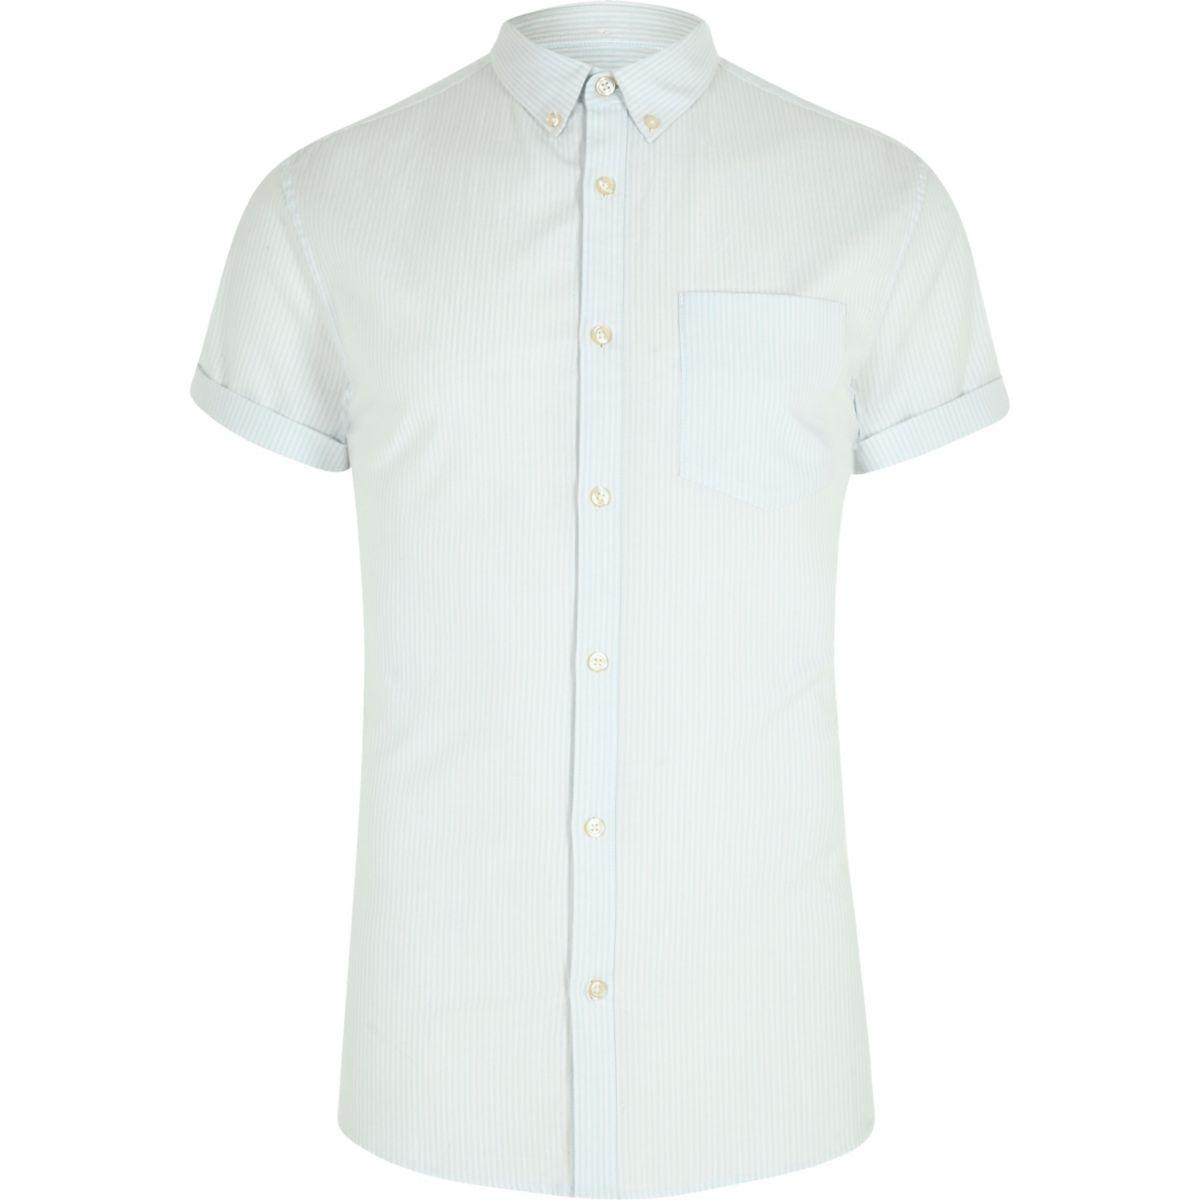 Green stripe short sleeve muscle fit shirt